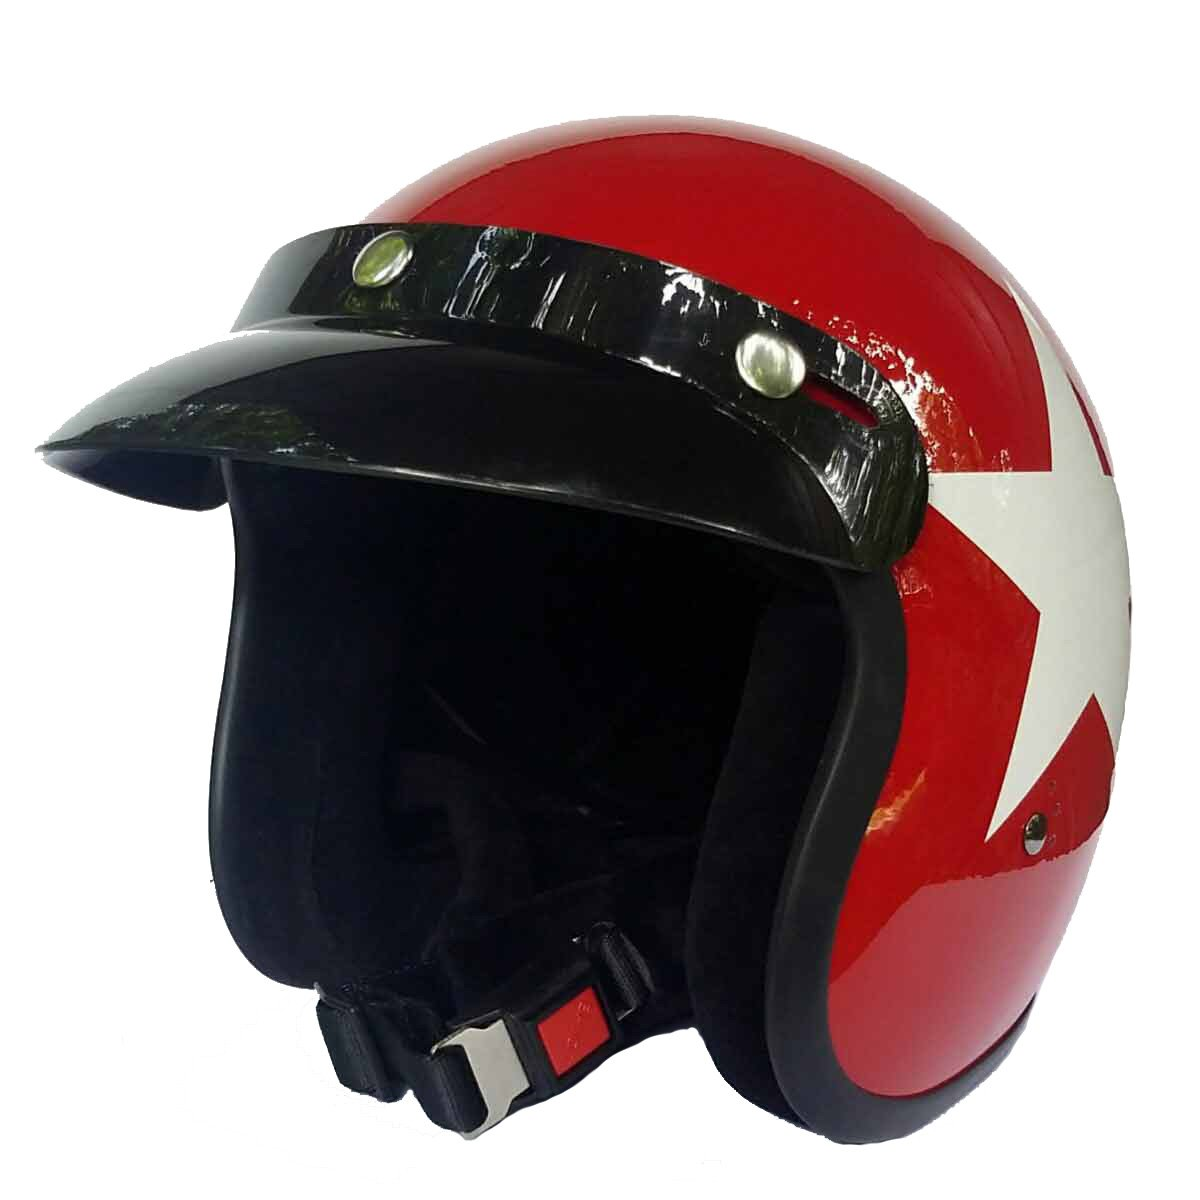 Sports-Farbe:Red Gr/ö/ße:M Bandit Helm Star Red Jet Futter-schwarz leicht bequem Roller 57-58cm